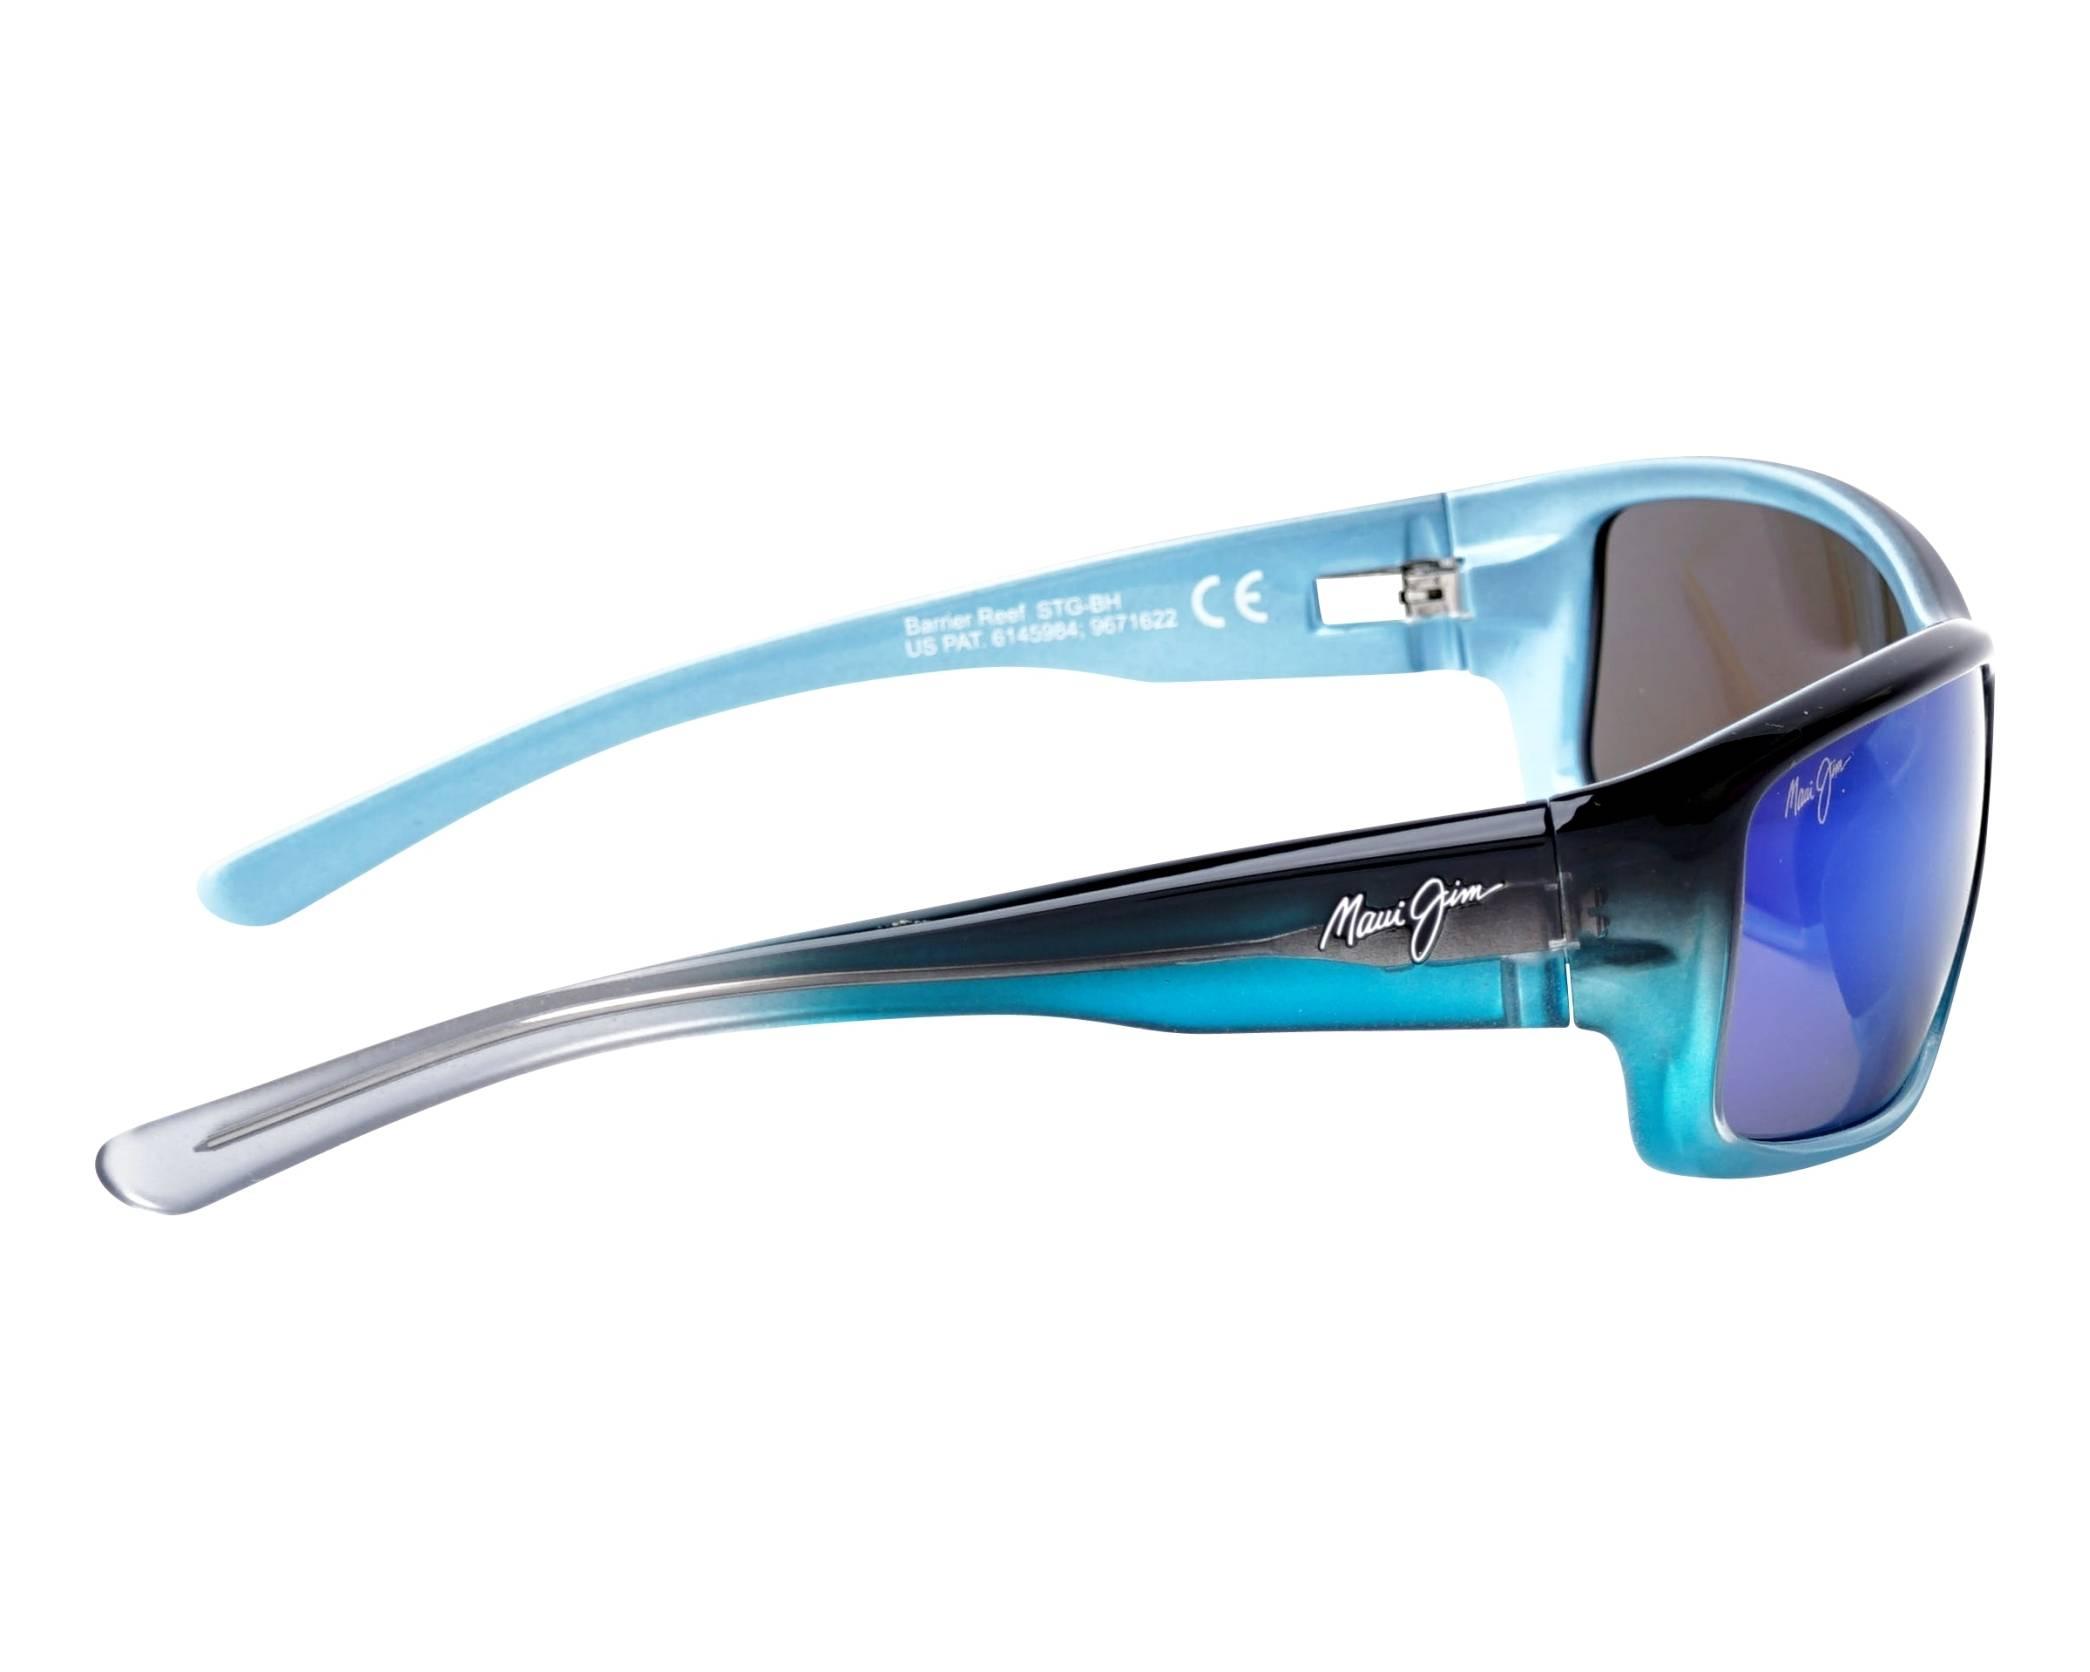 a854750c7fb Sunglasses Maui Jim BARRIER REEF B-792-06C 62-17 Blue Turquoise side